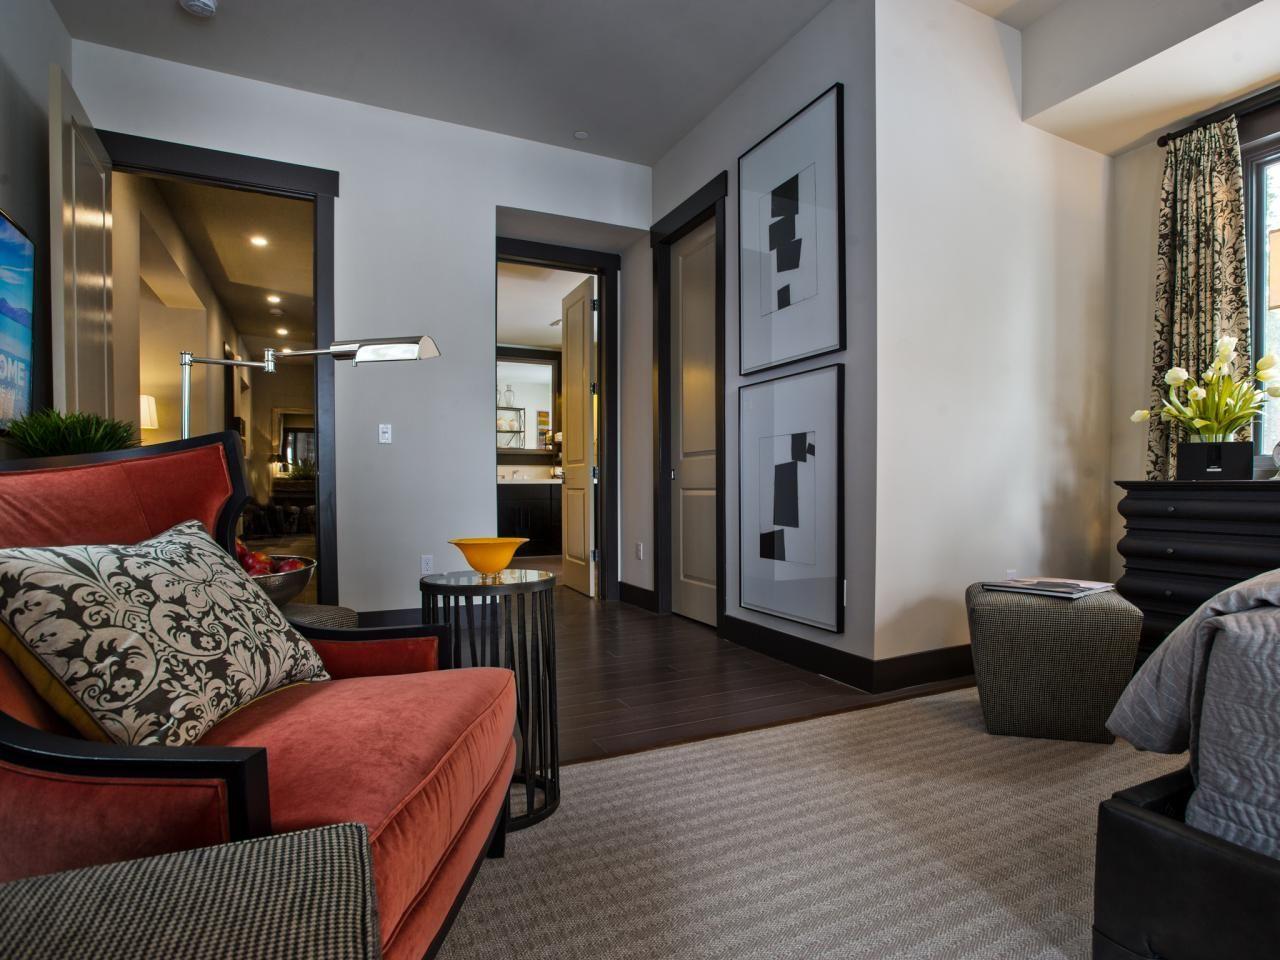 Master Bedroom Dream Home 2014